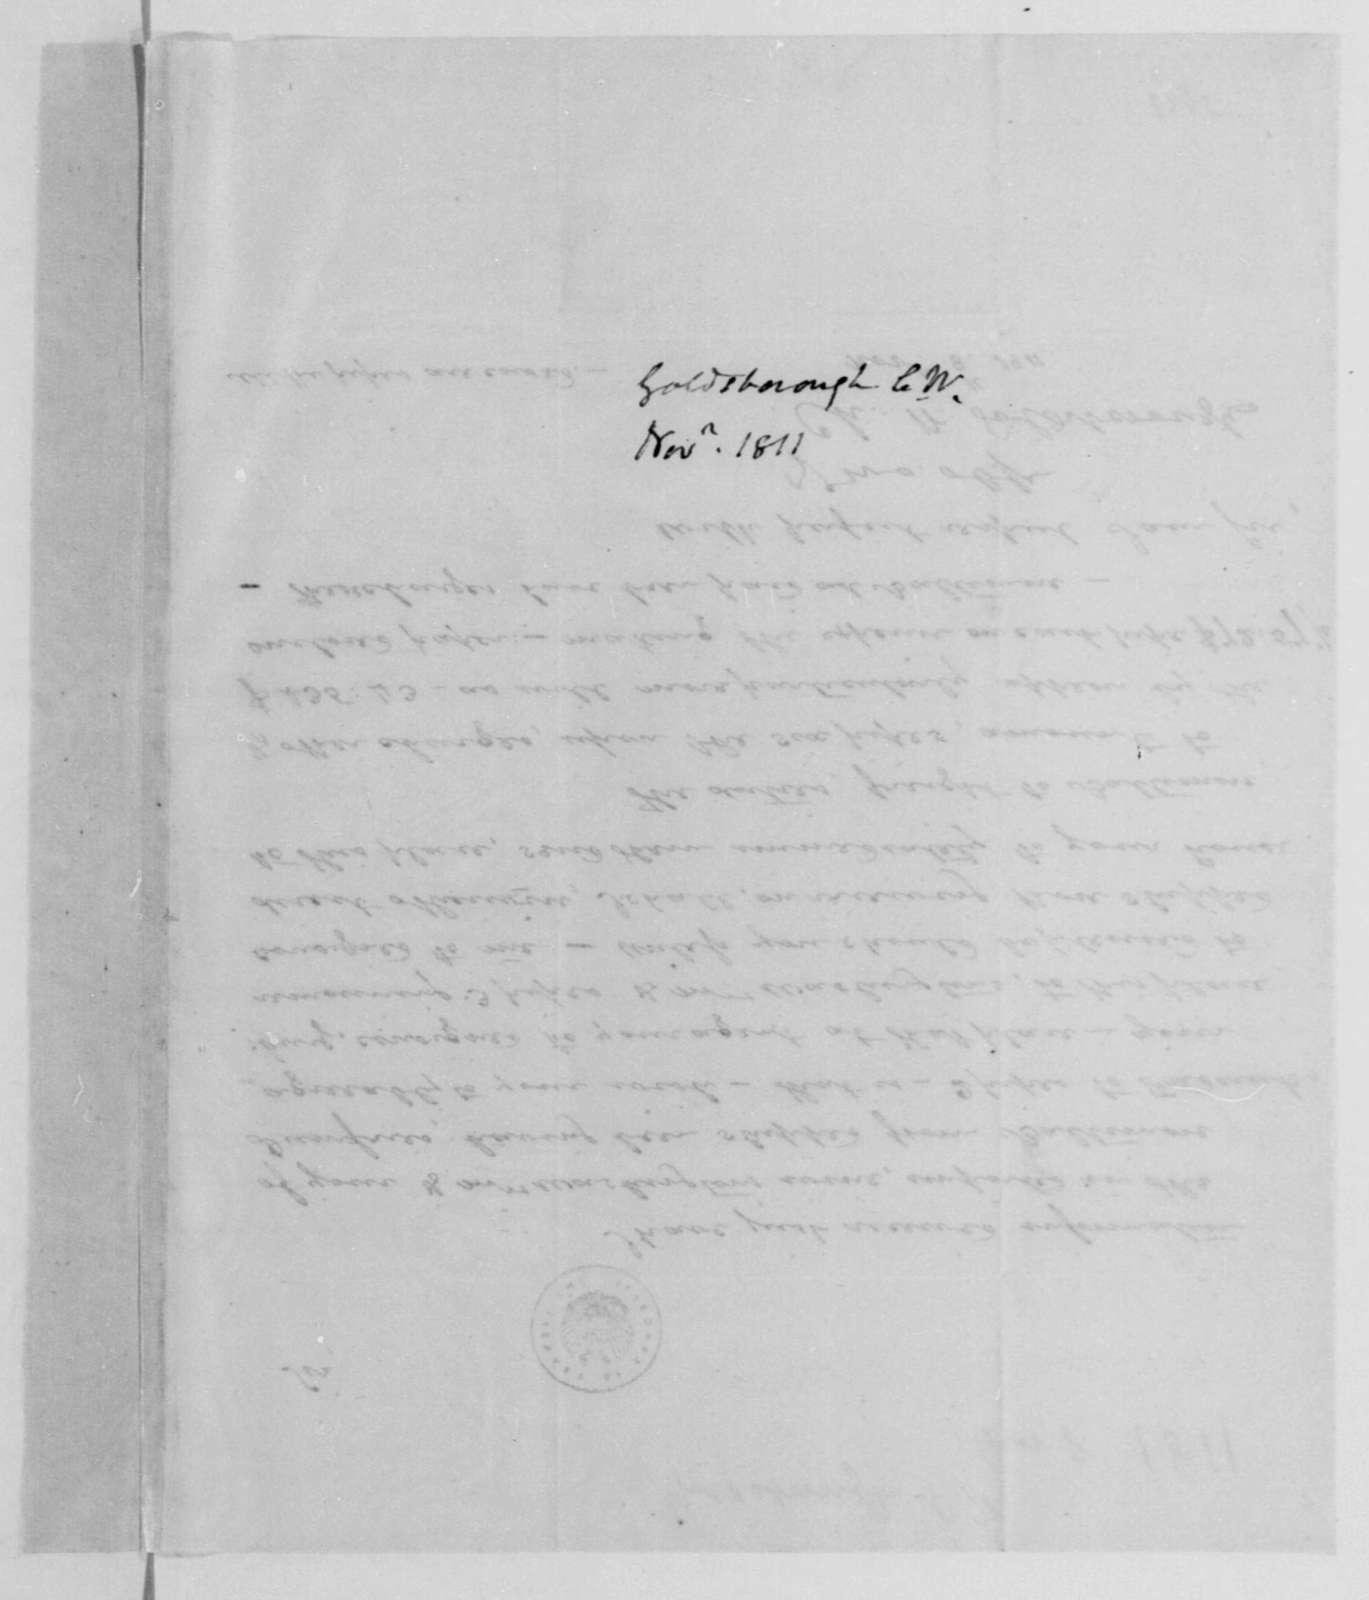 Charles W. Goldsborough to James Madison, November 8, 1811.